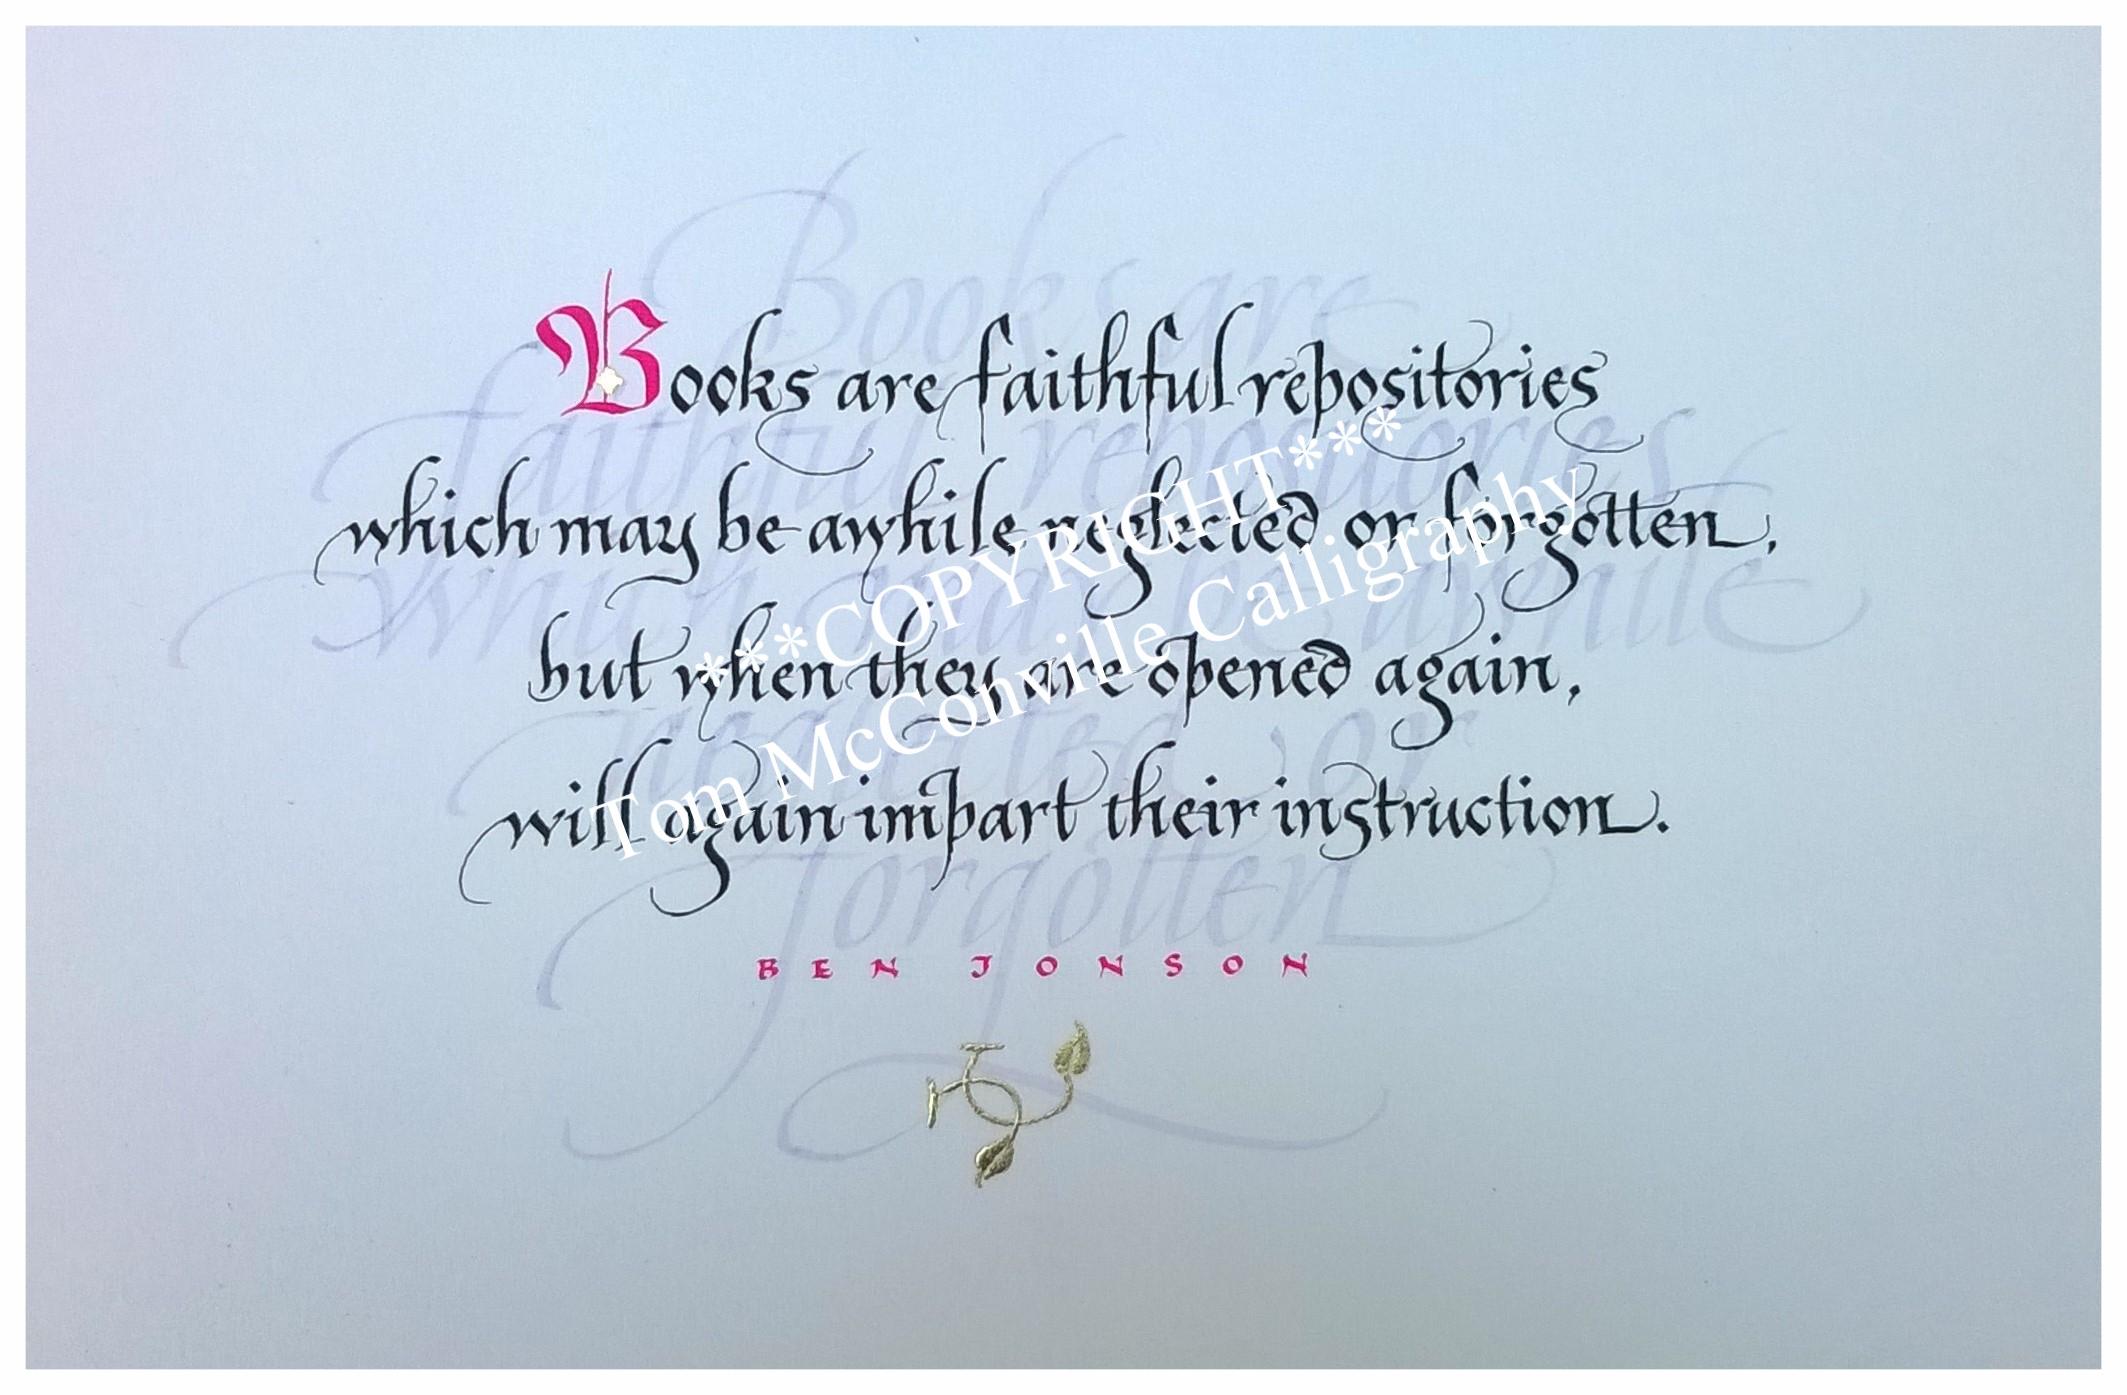 'Books are faithful repositories...' by Ben Jonson